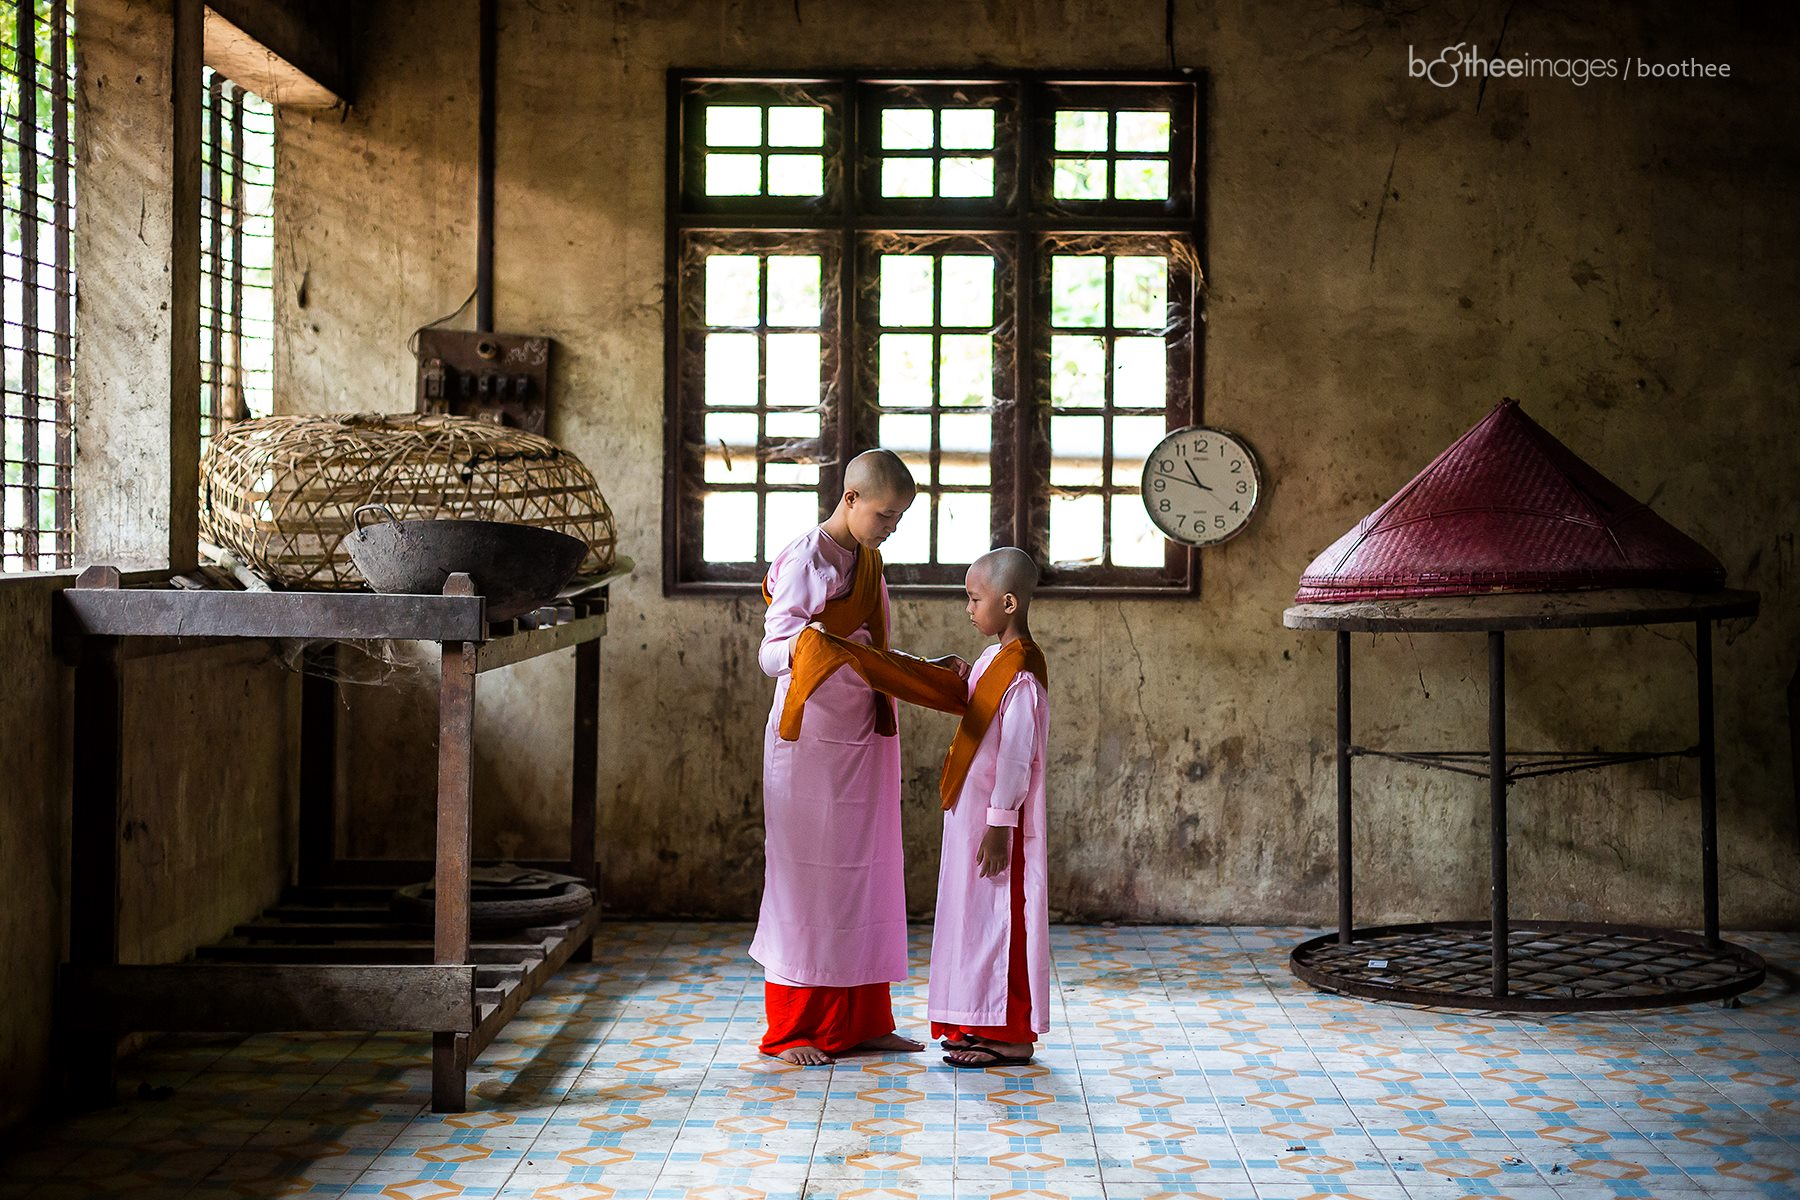 Burma photo tour image in Mandalay